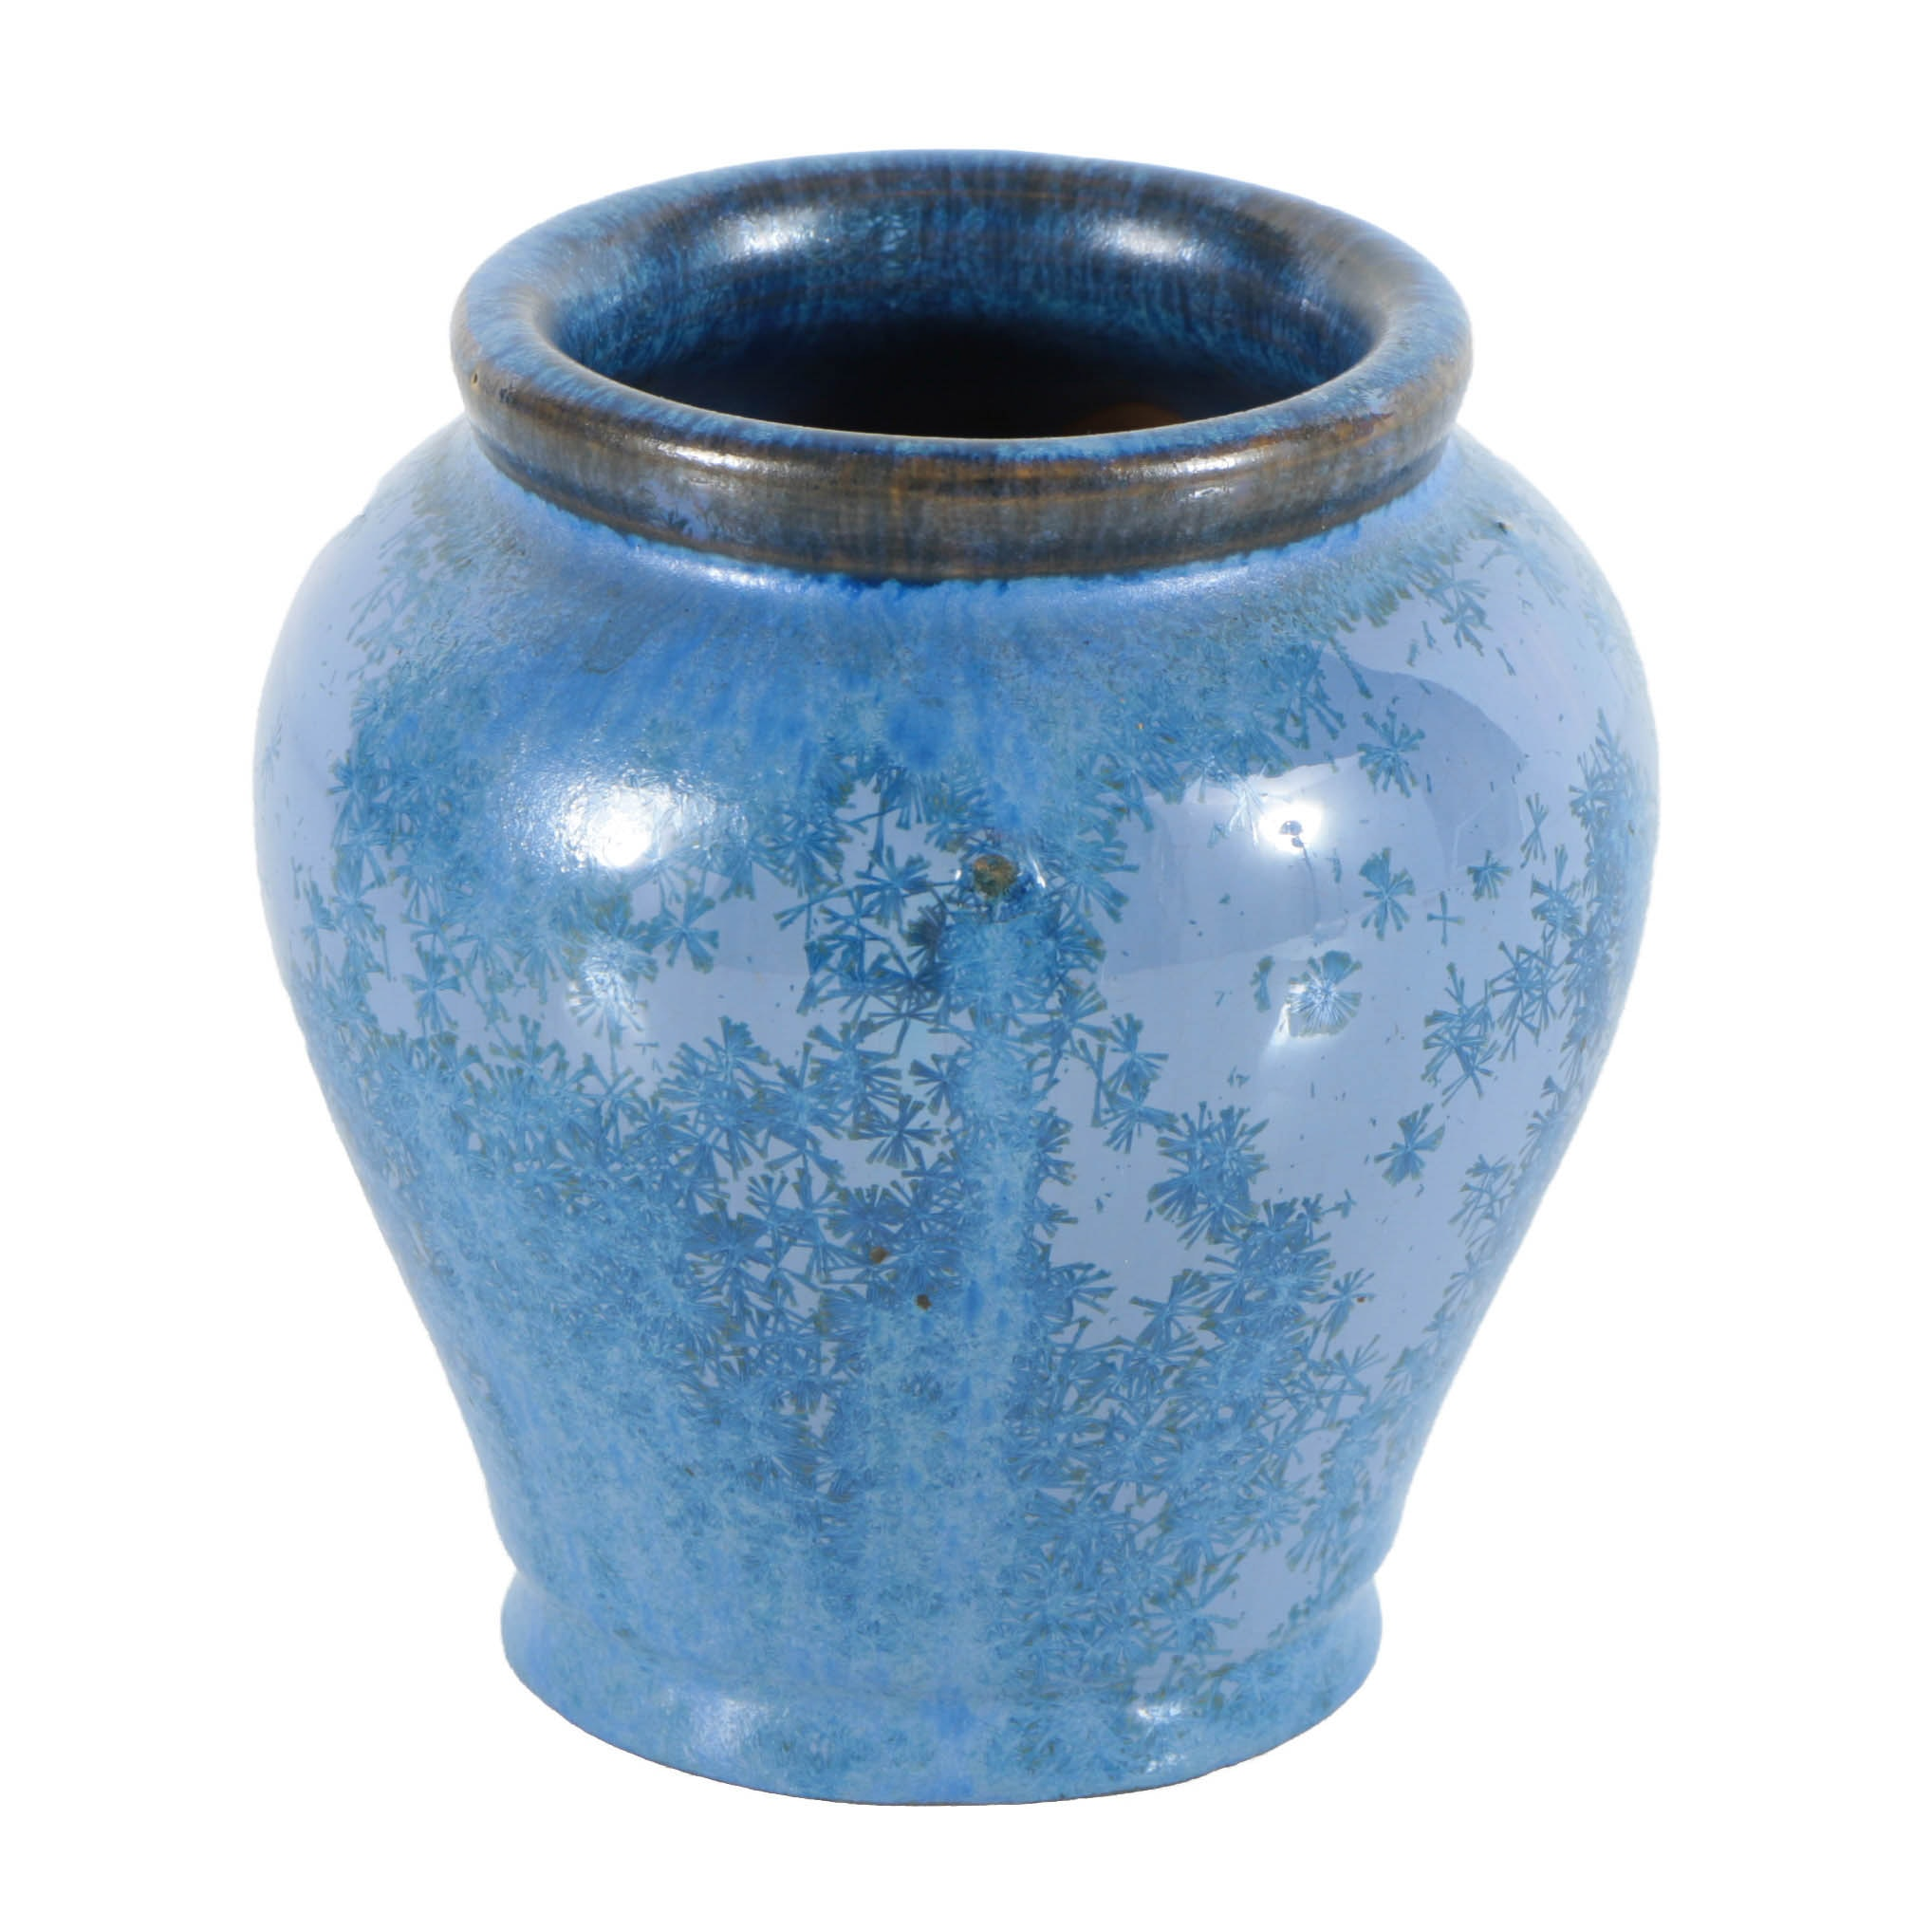 Middle Period Fulper Crystalline Vase